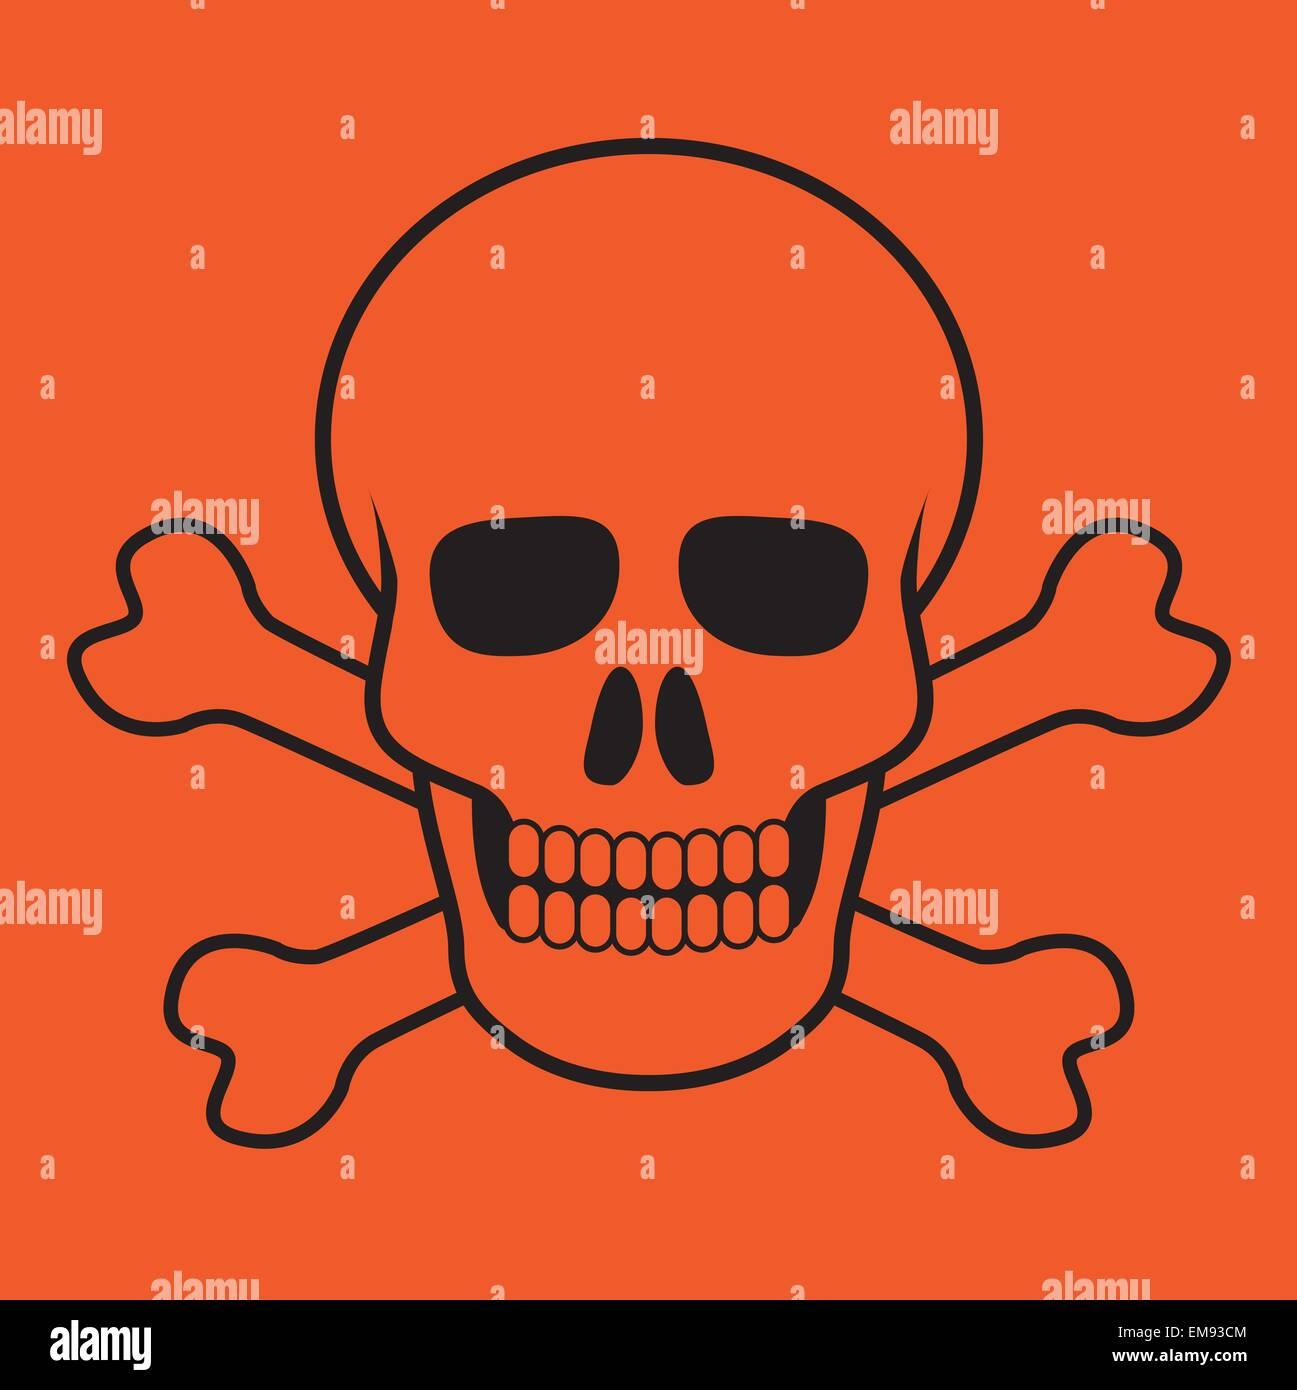 skull and bones - Stock Image